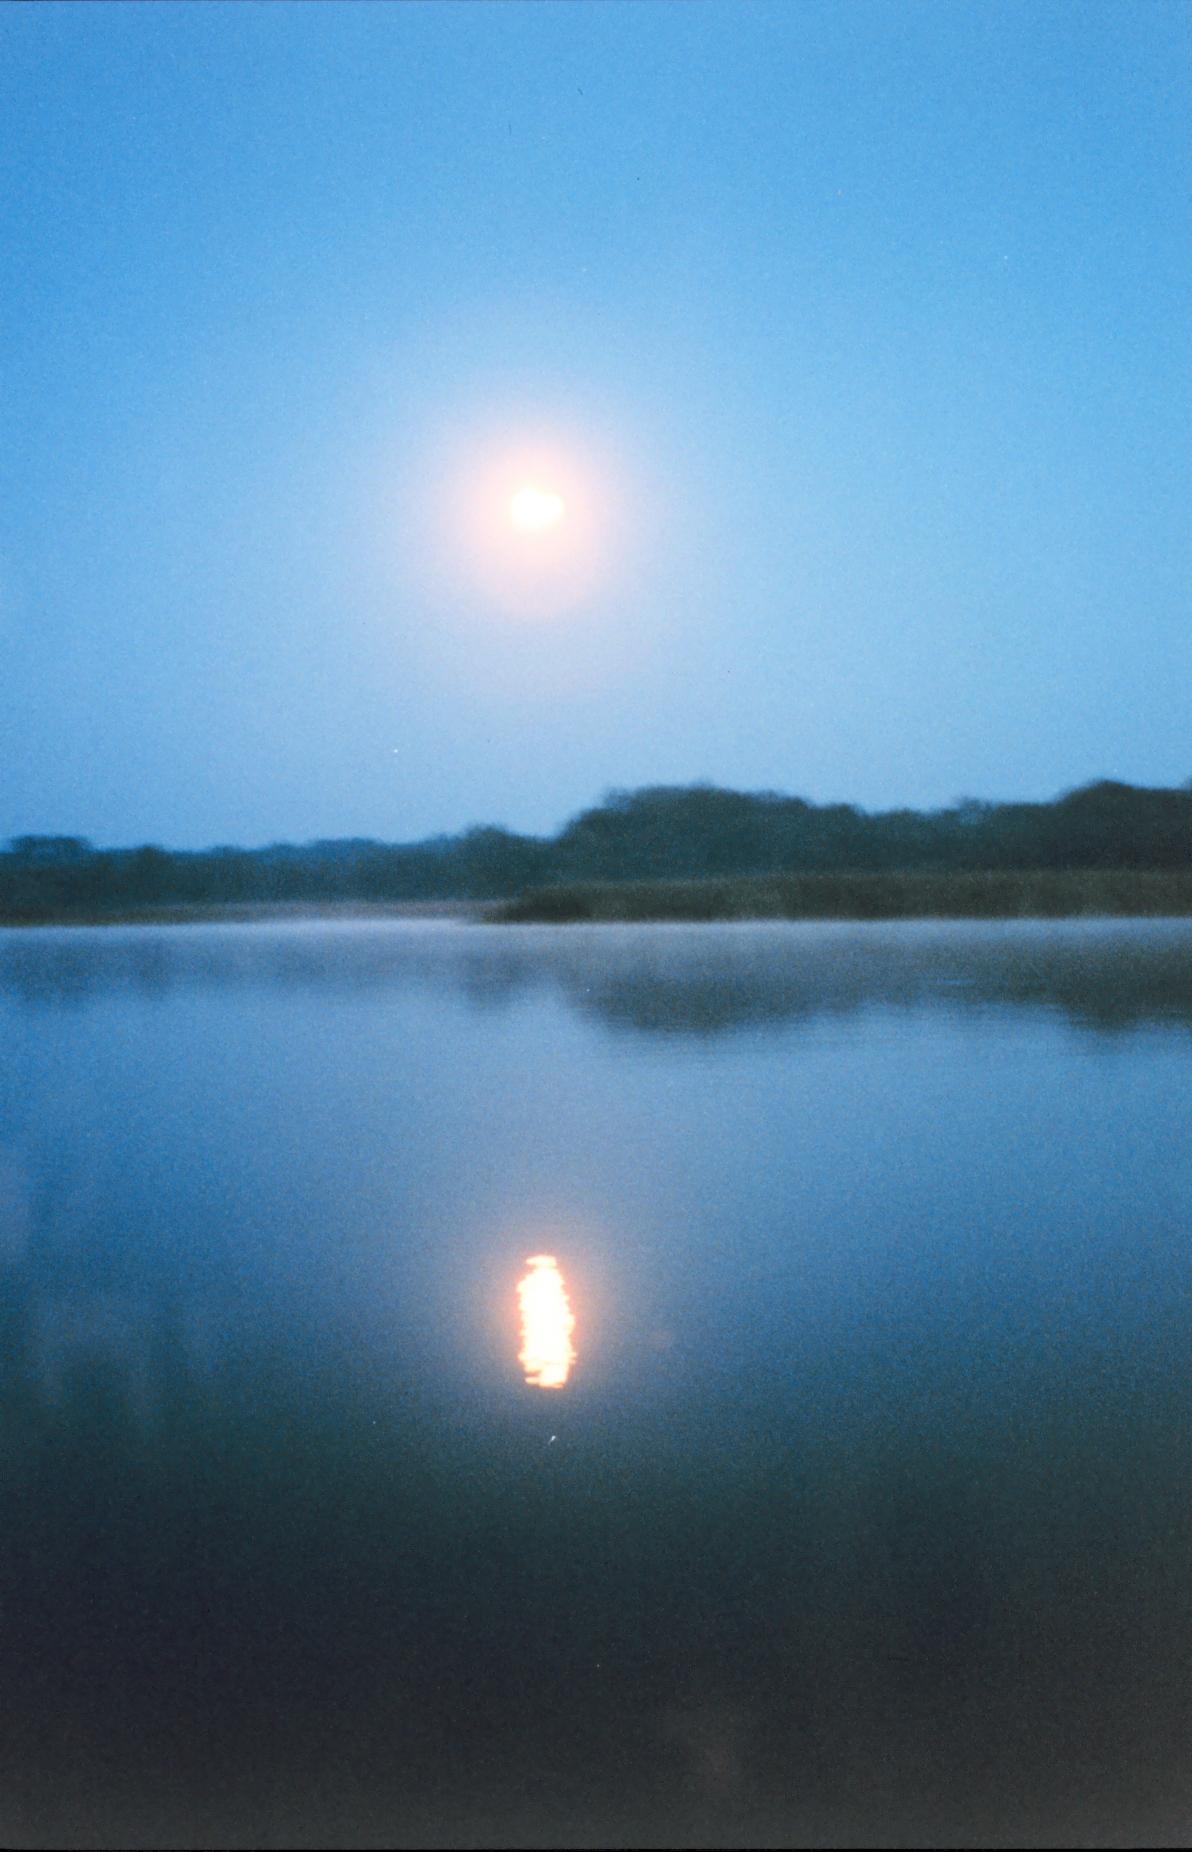 A_full_moon_reflecting_off_the_river_-_NOAA.jpg?uselang=fr